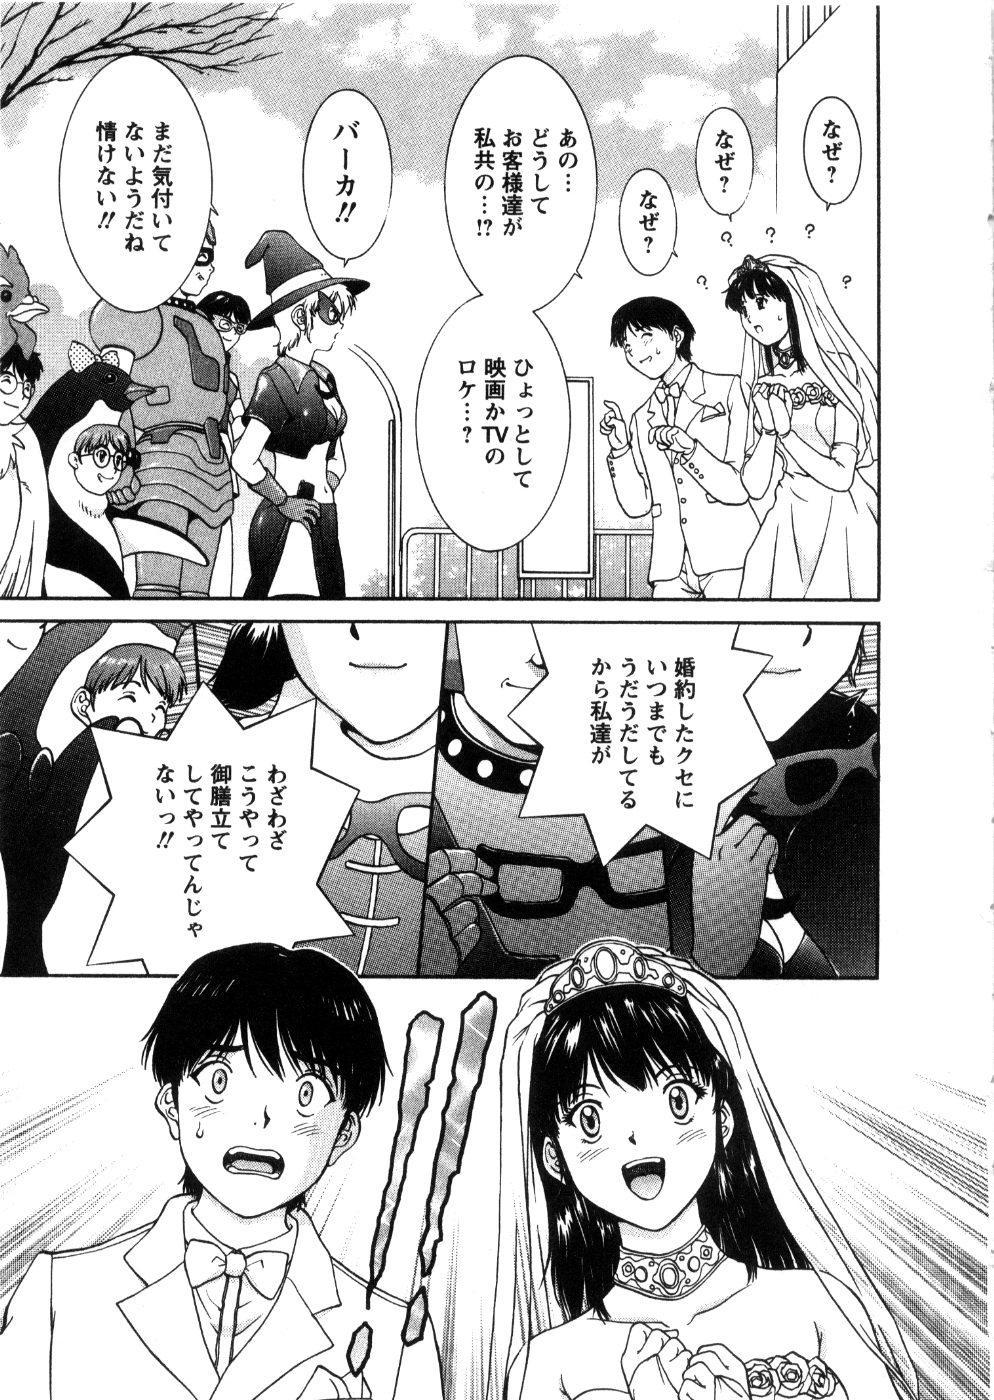 Oneechan-tachi ga Yatte Kuru 03 180